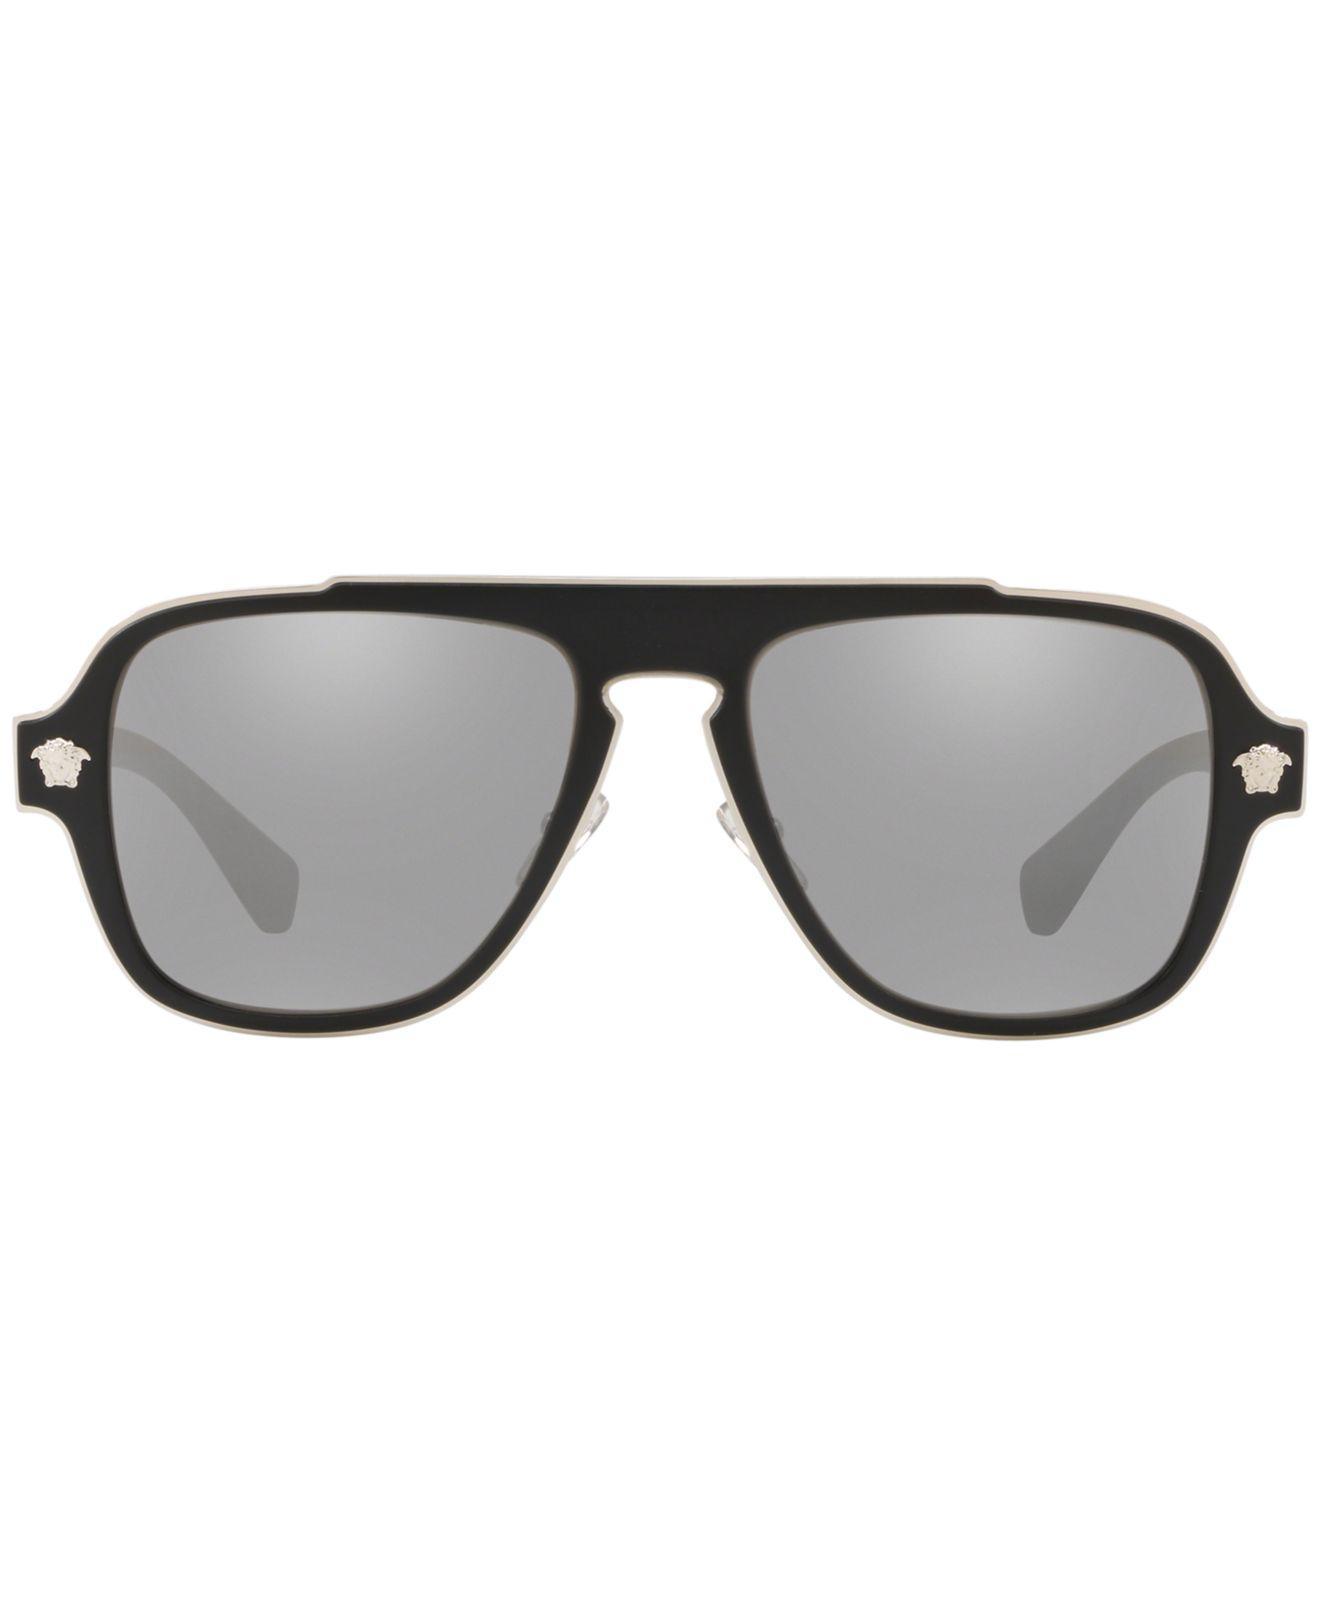 d0b90682f5f Lyst - Versace Ve2199 for Men